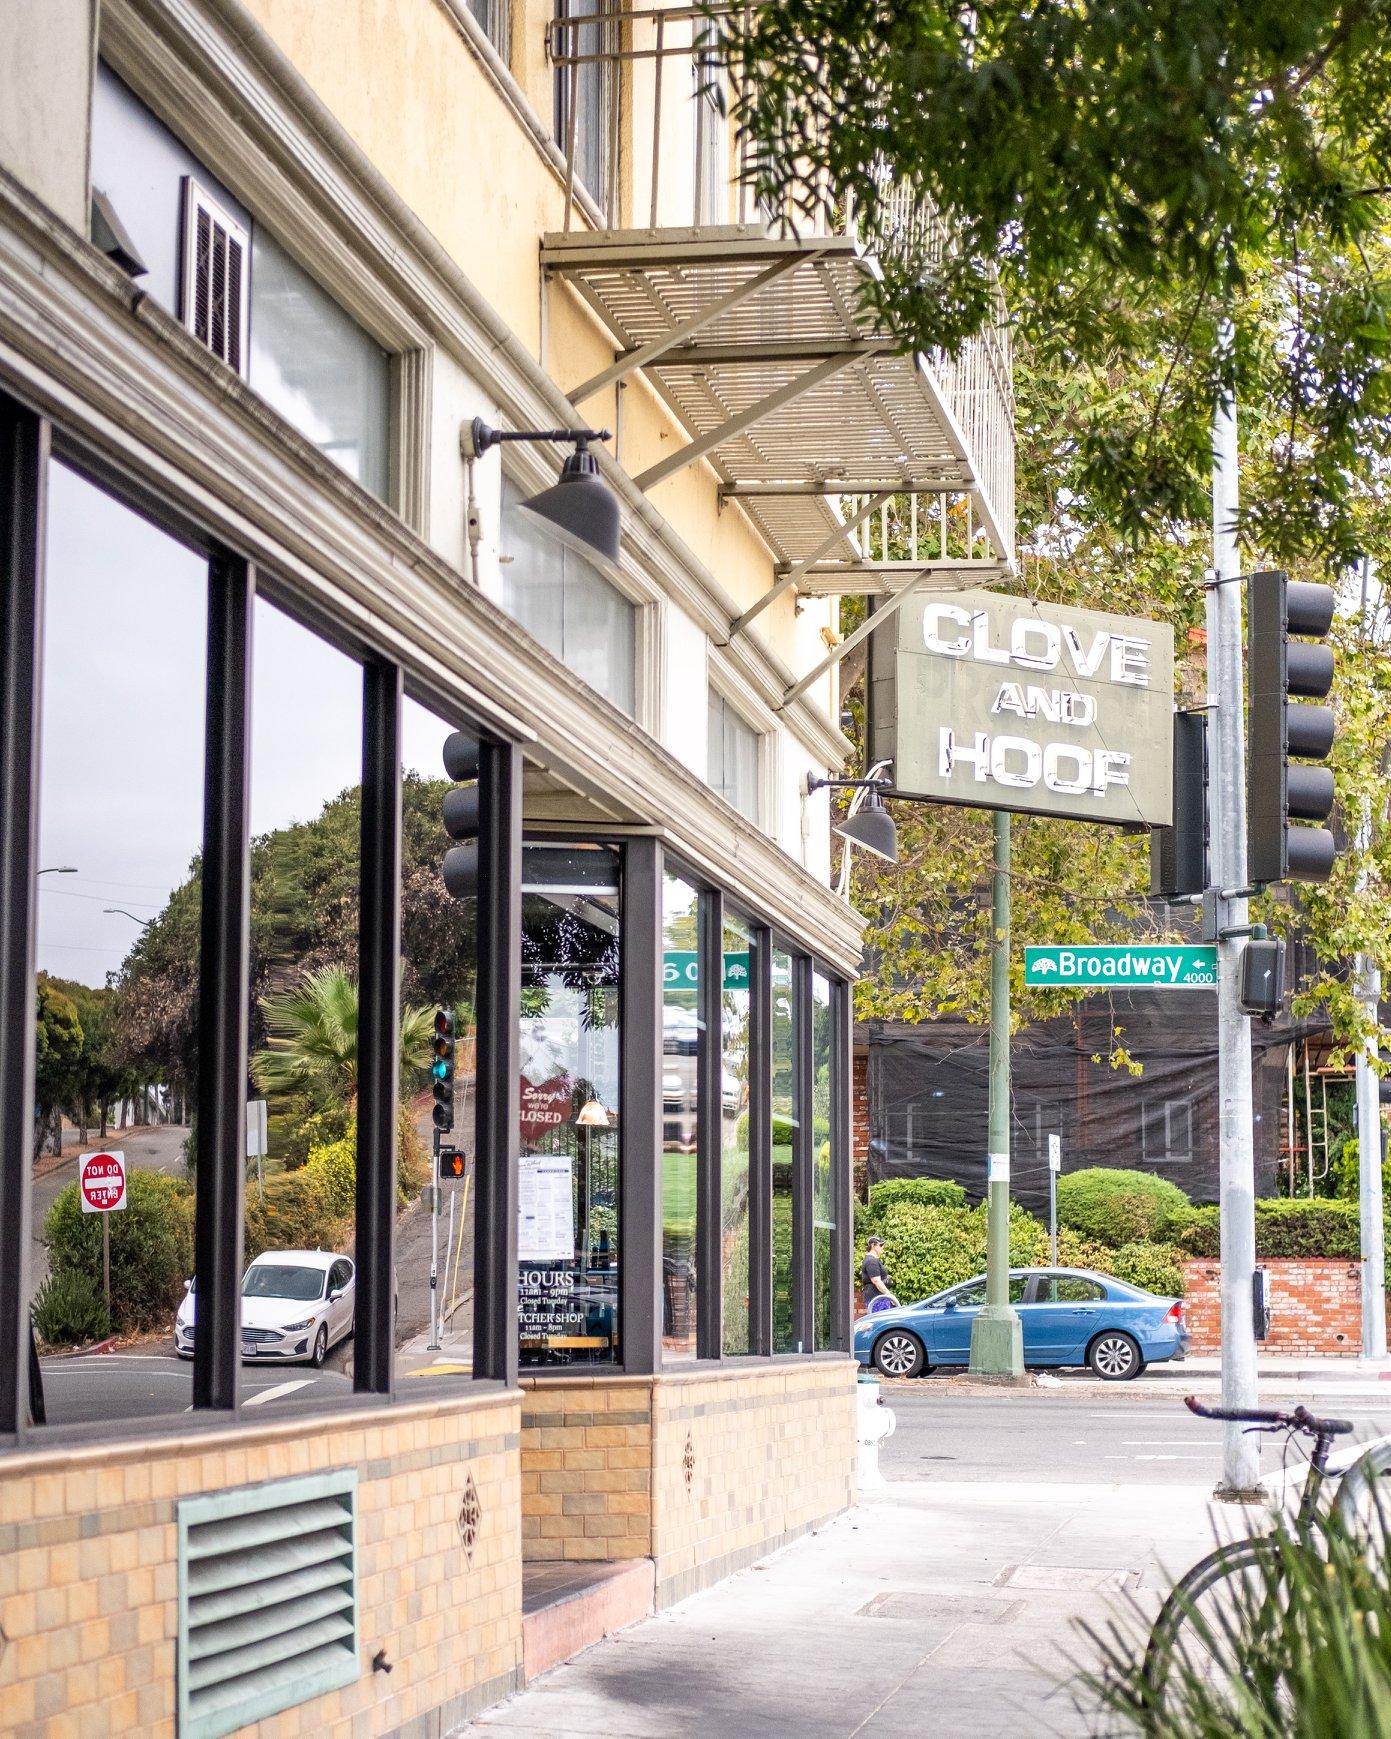 Clove And Hoof 4001 Broadway, Oakland